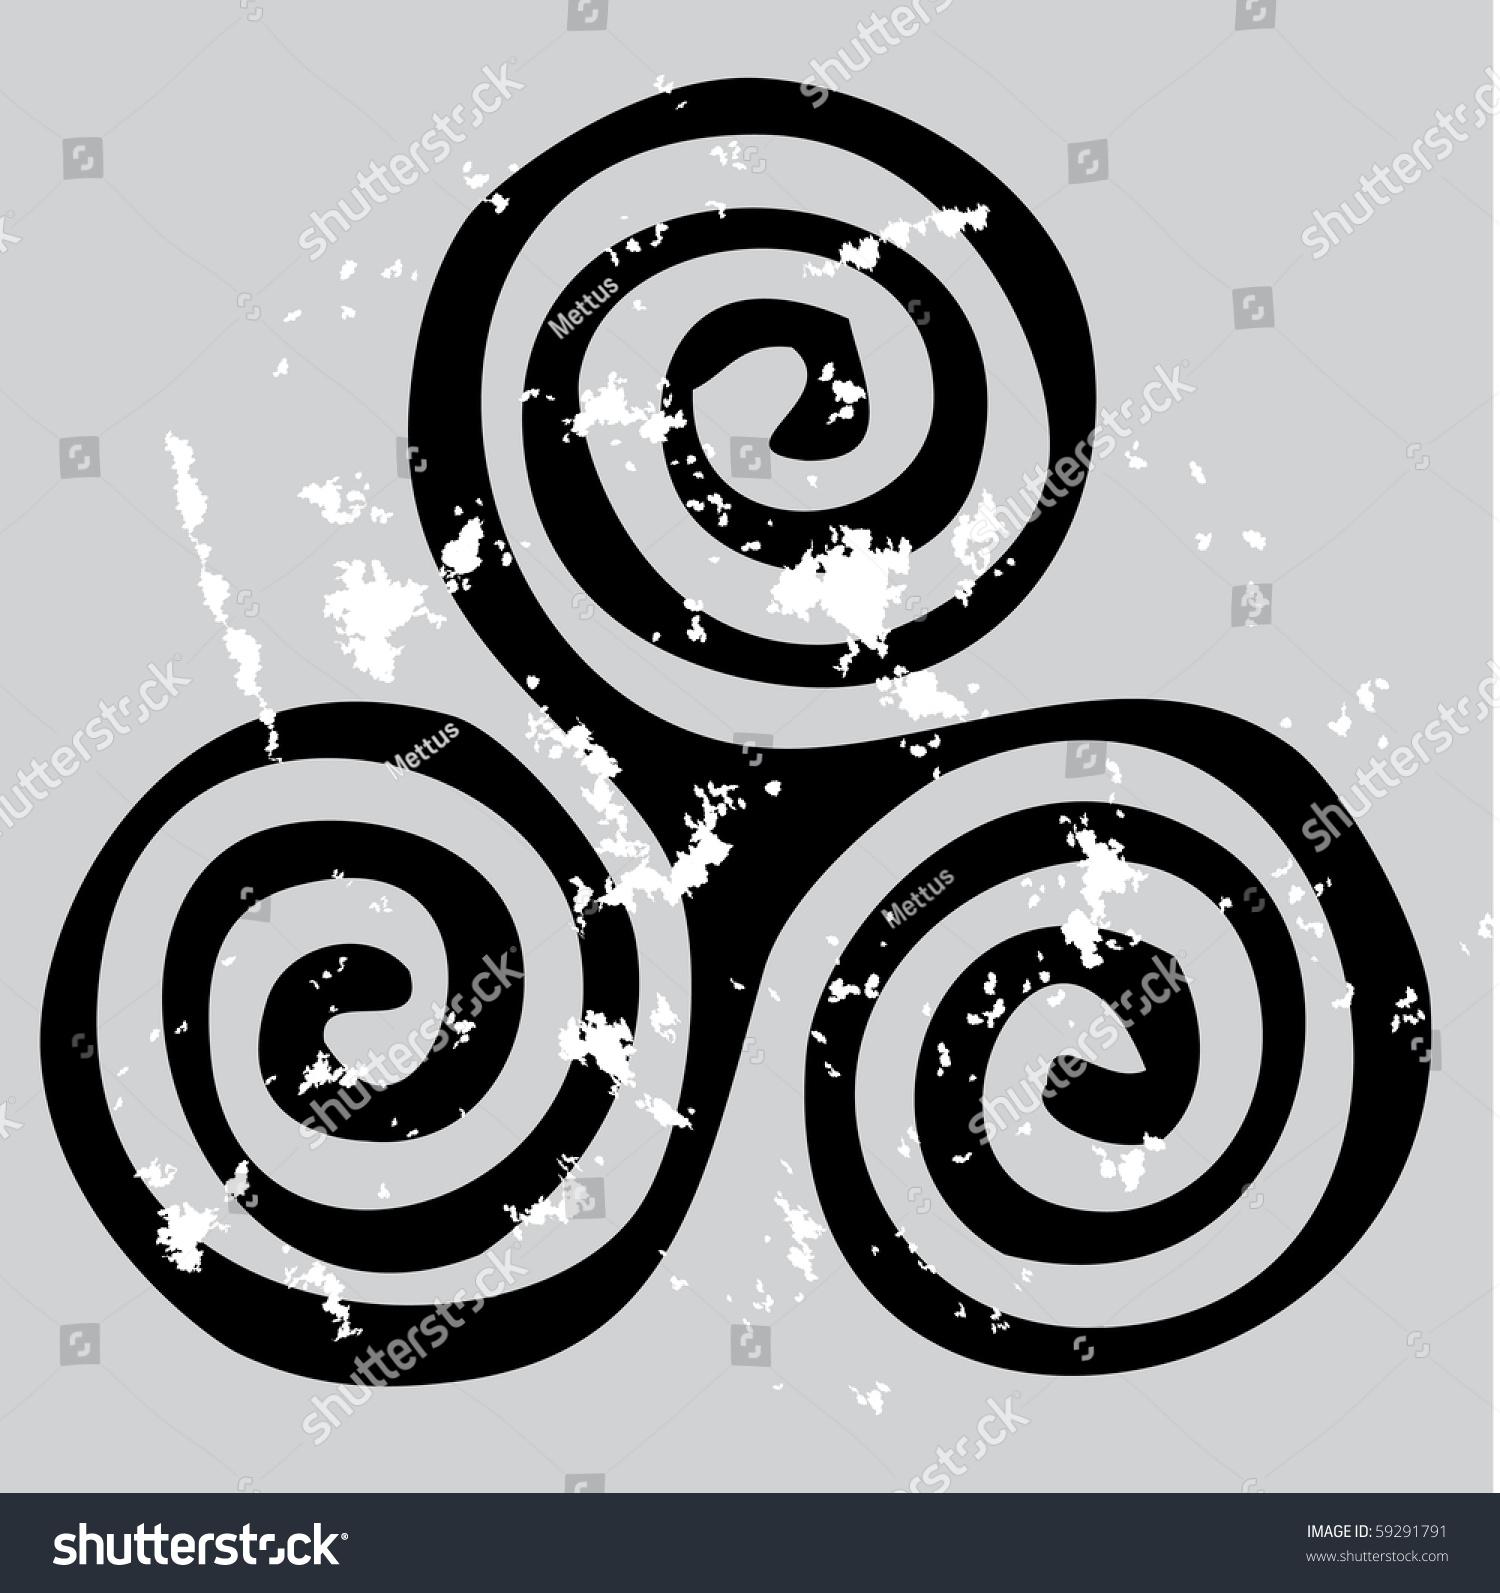 Black celtic spiral on gray grunge stock vector 59291791 black celtic spiral on the gray grunge background triskelion isolated on grey color triskele buycottarizona Images